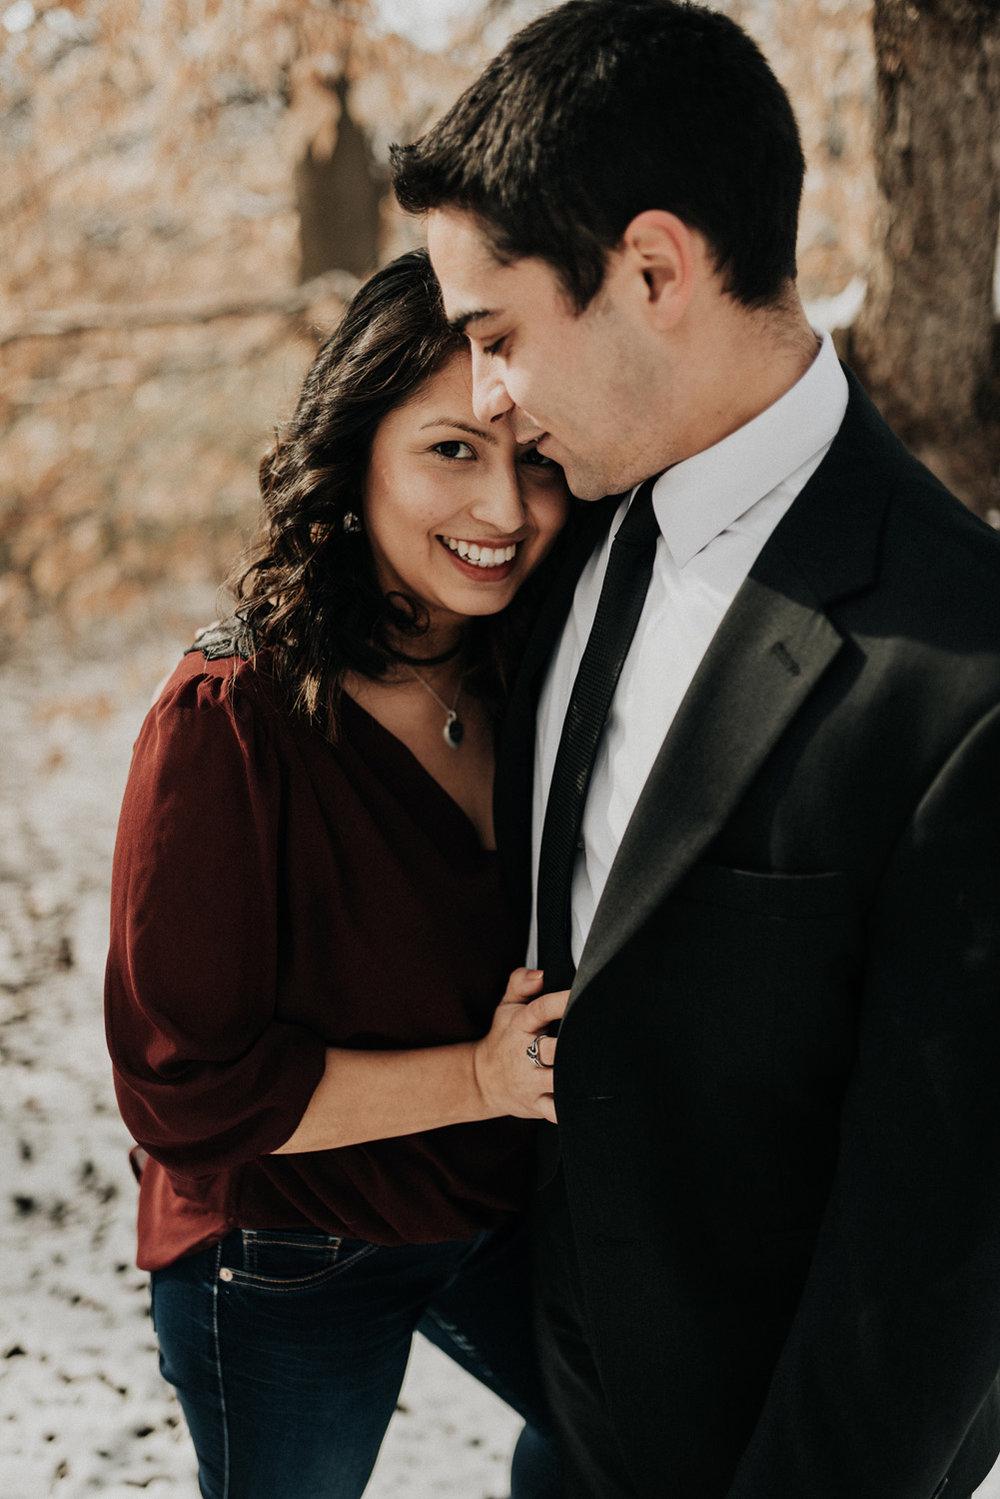 KyleWillisPhoto-Grounds-For-Sculpture-Hamilton-New-Jersey-Engagement-Photos-Photographer-Wedding